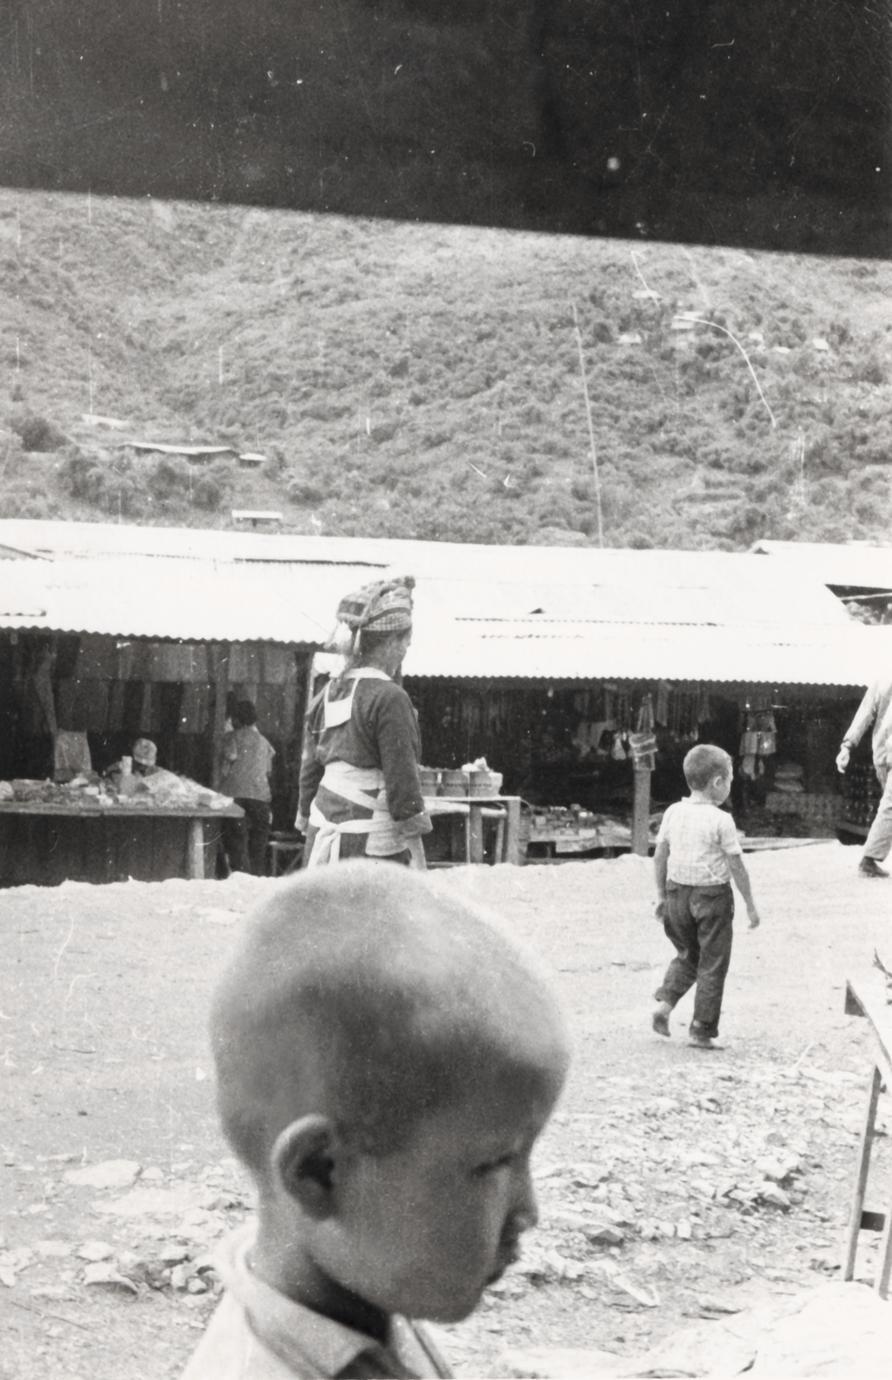 A White Hmong woman walks near a market in Xiang Khoang Province